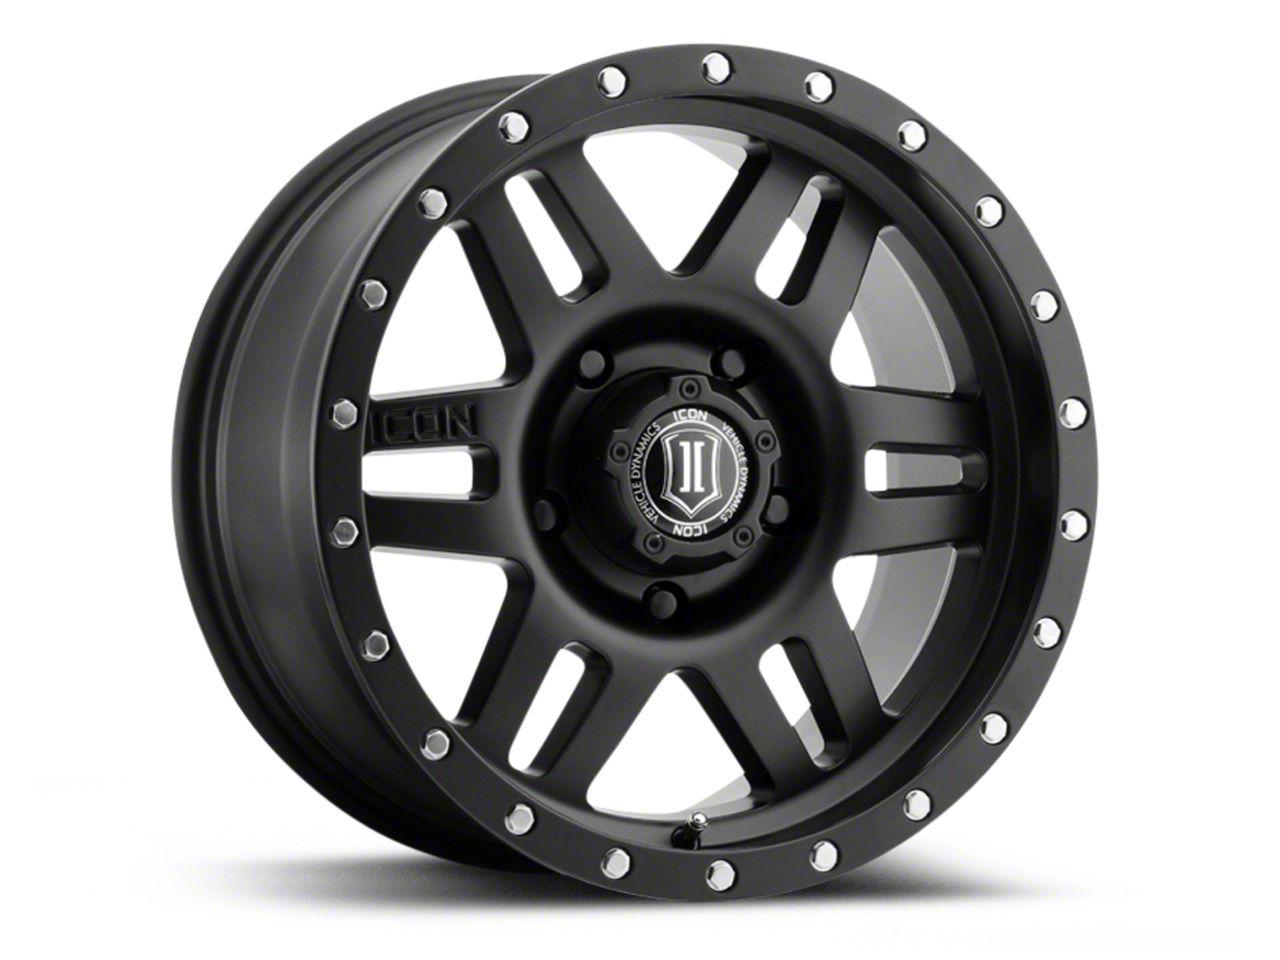 ICON Vehicle Dynamics Six Speed Satin Black 6-Lug Wheel - 17x8.5 (04-18 F-150)